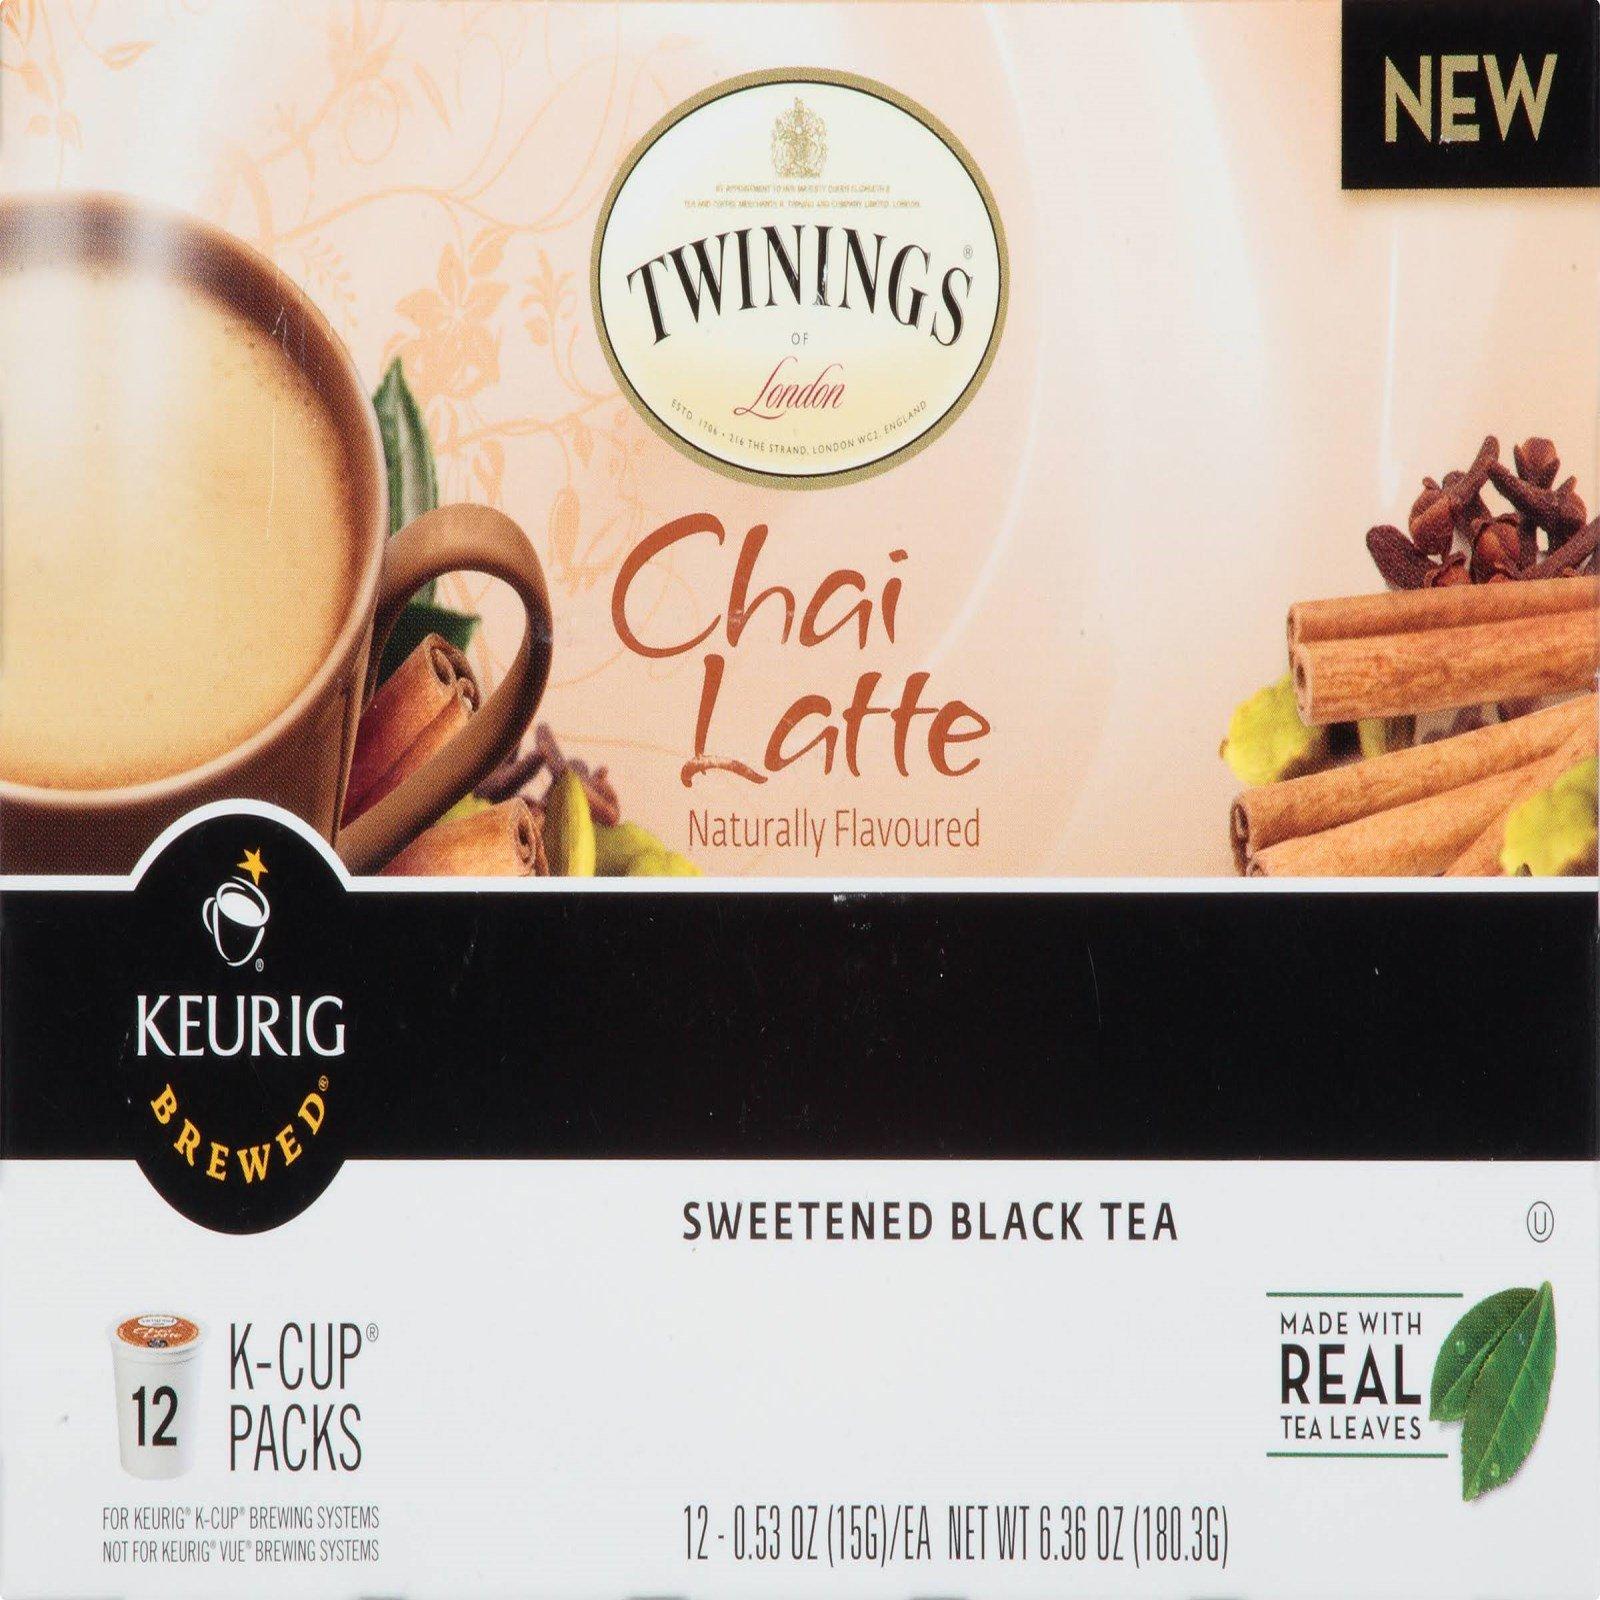 Twinings, Chai Latte, Sweetened Black